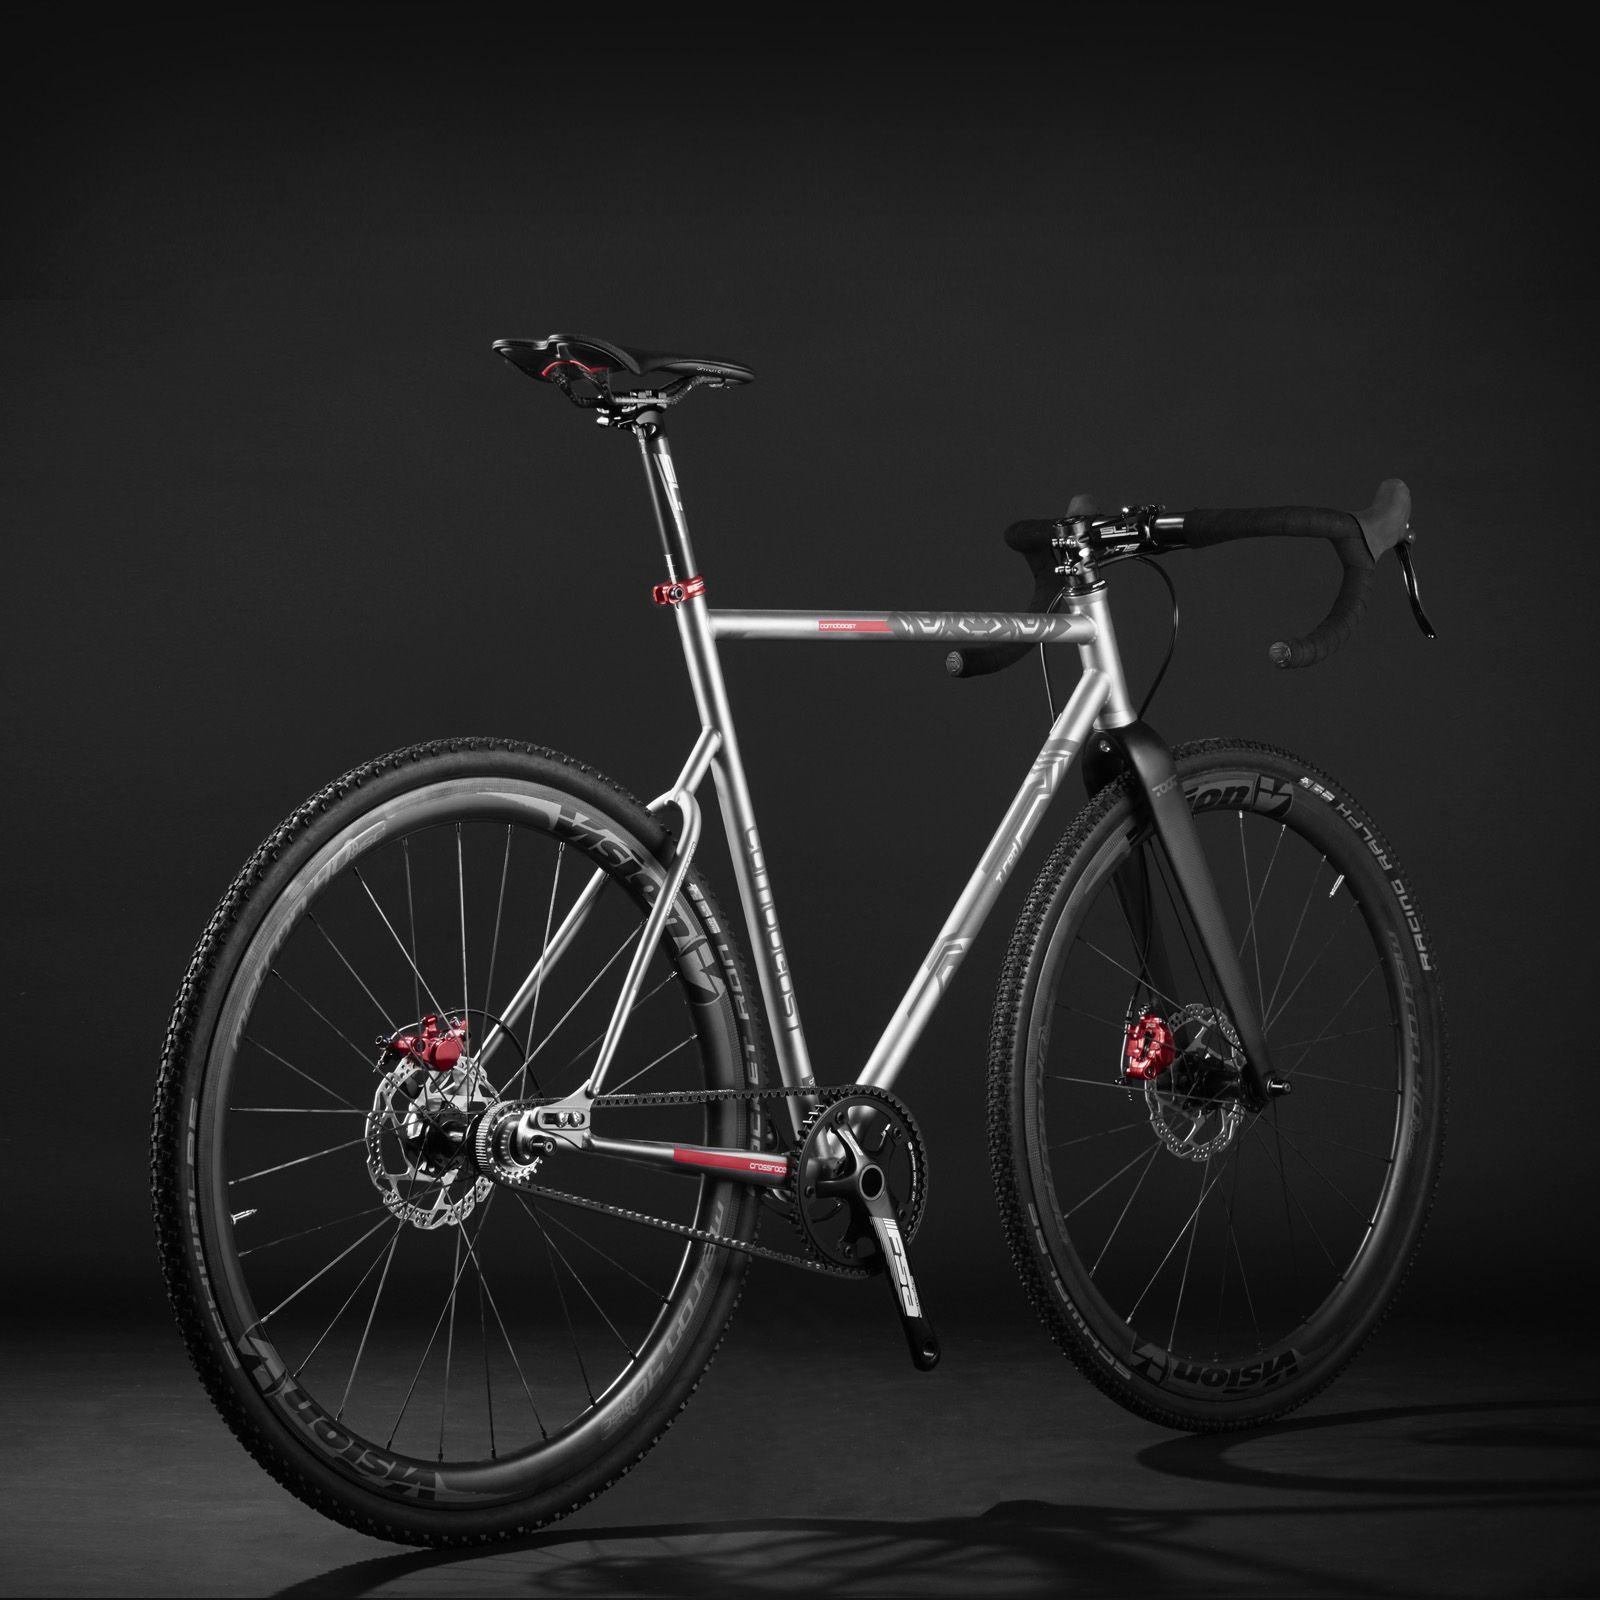 Pin de Michael B en Road bikes | Pinterest | Bicicleta, Ciclocross y ...